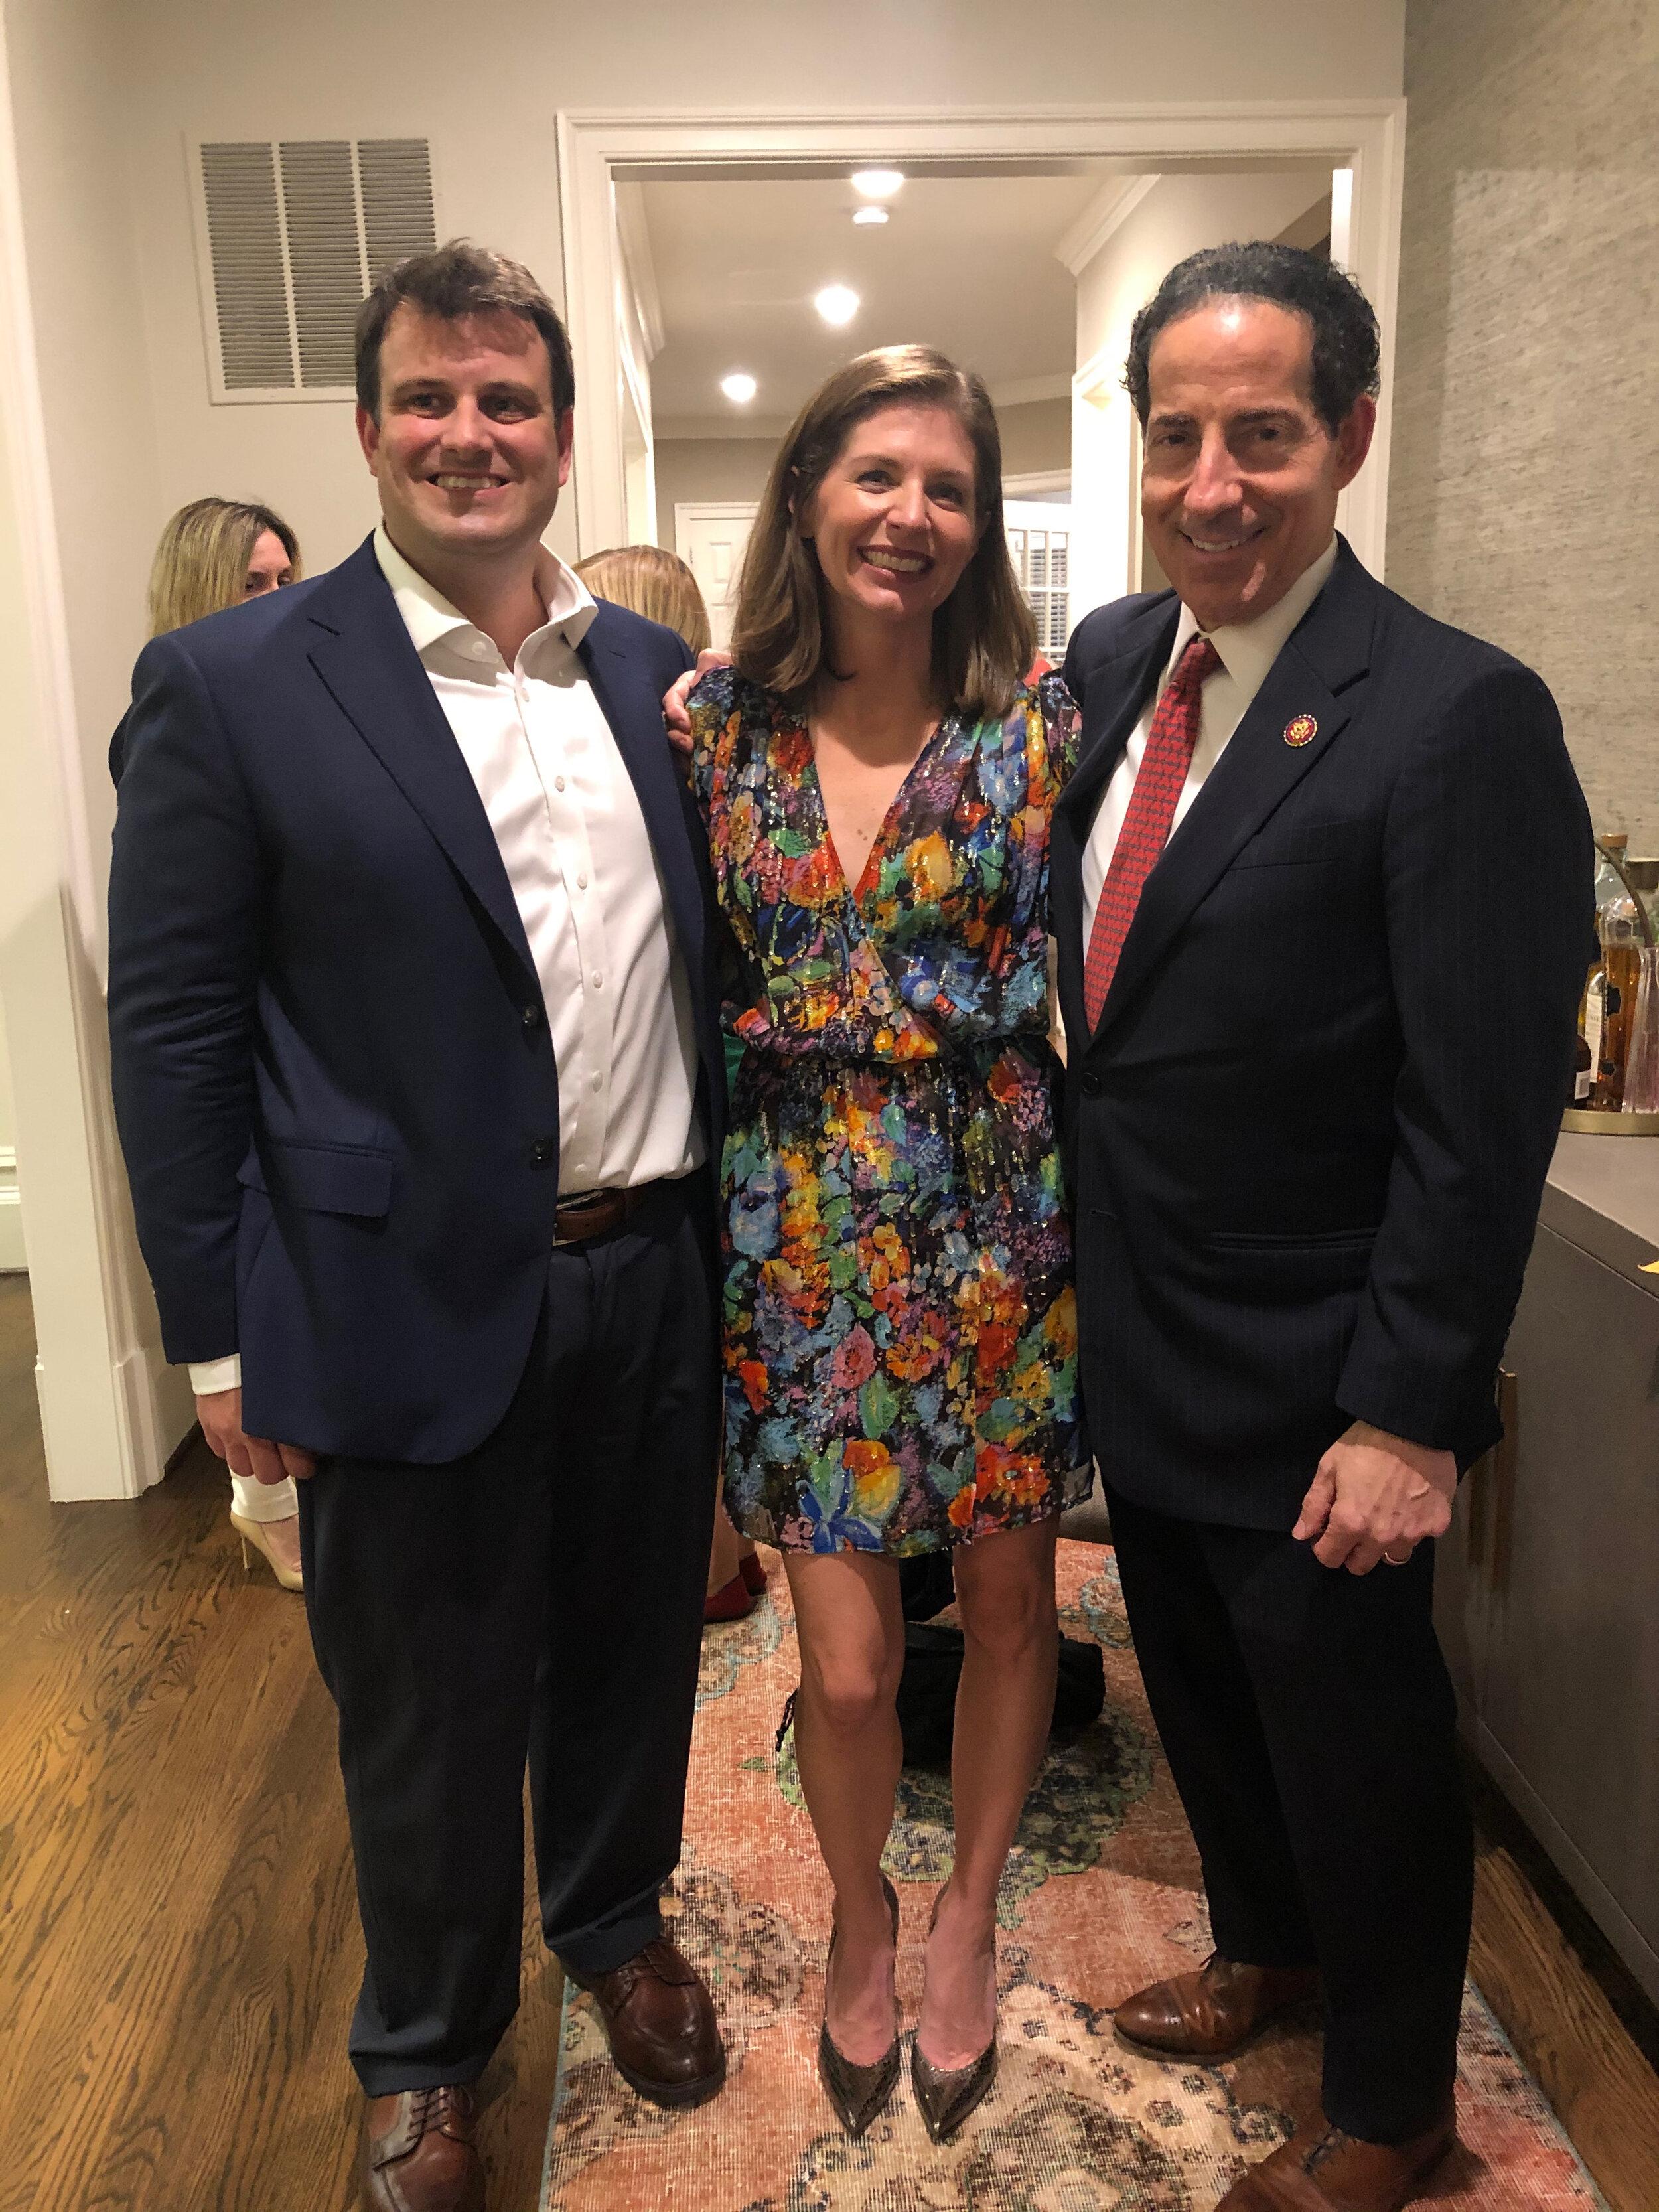 Tom, me, Congressman Raskin